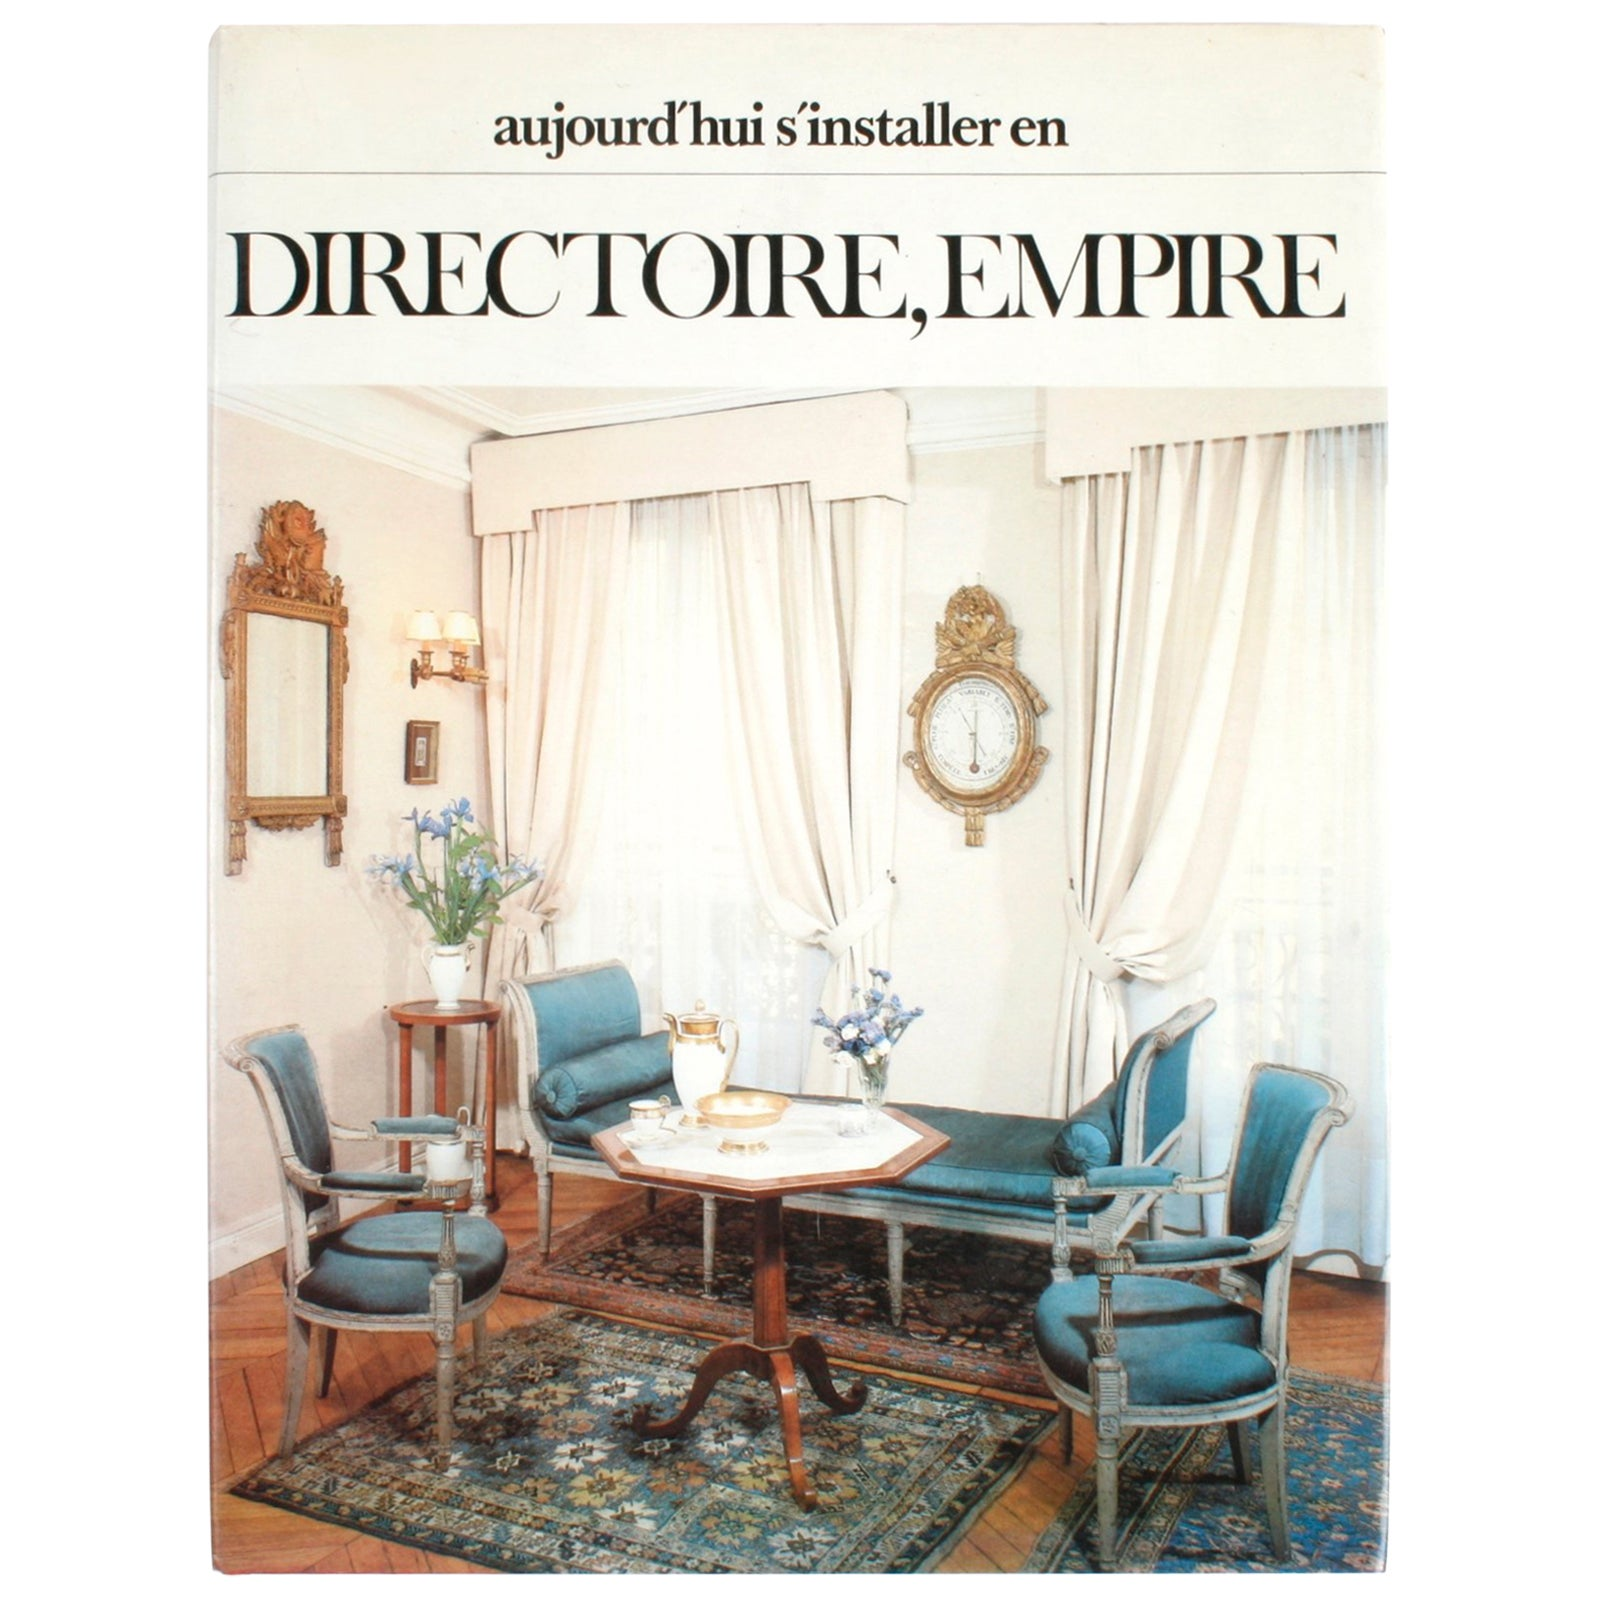 Aujourd'hui s'Installer en Directoire, Empire by Pierre-Marie Favelac, 1st Ed